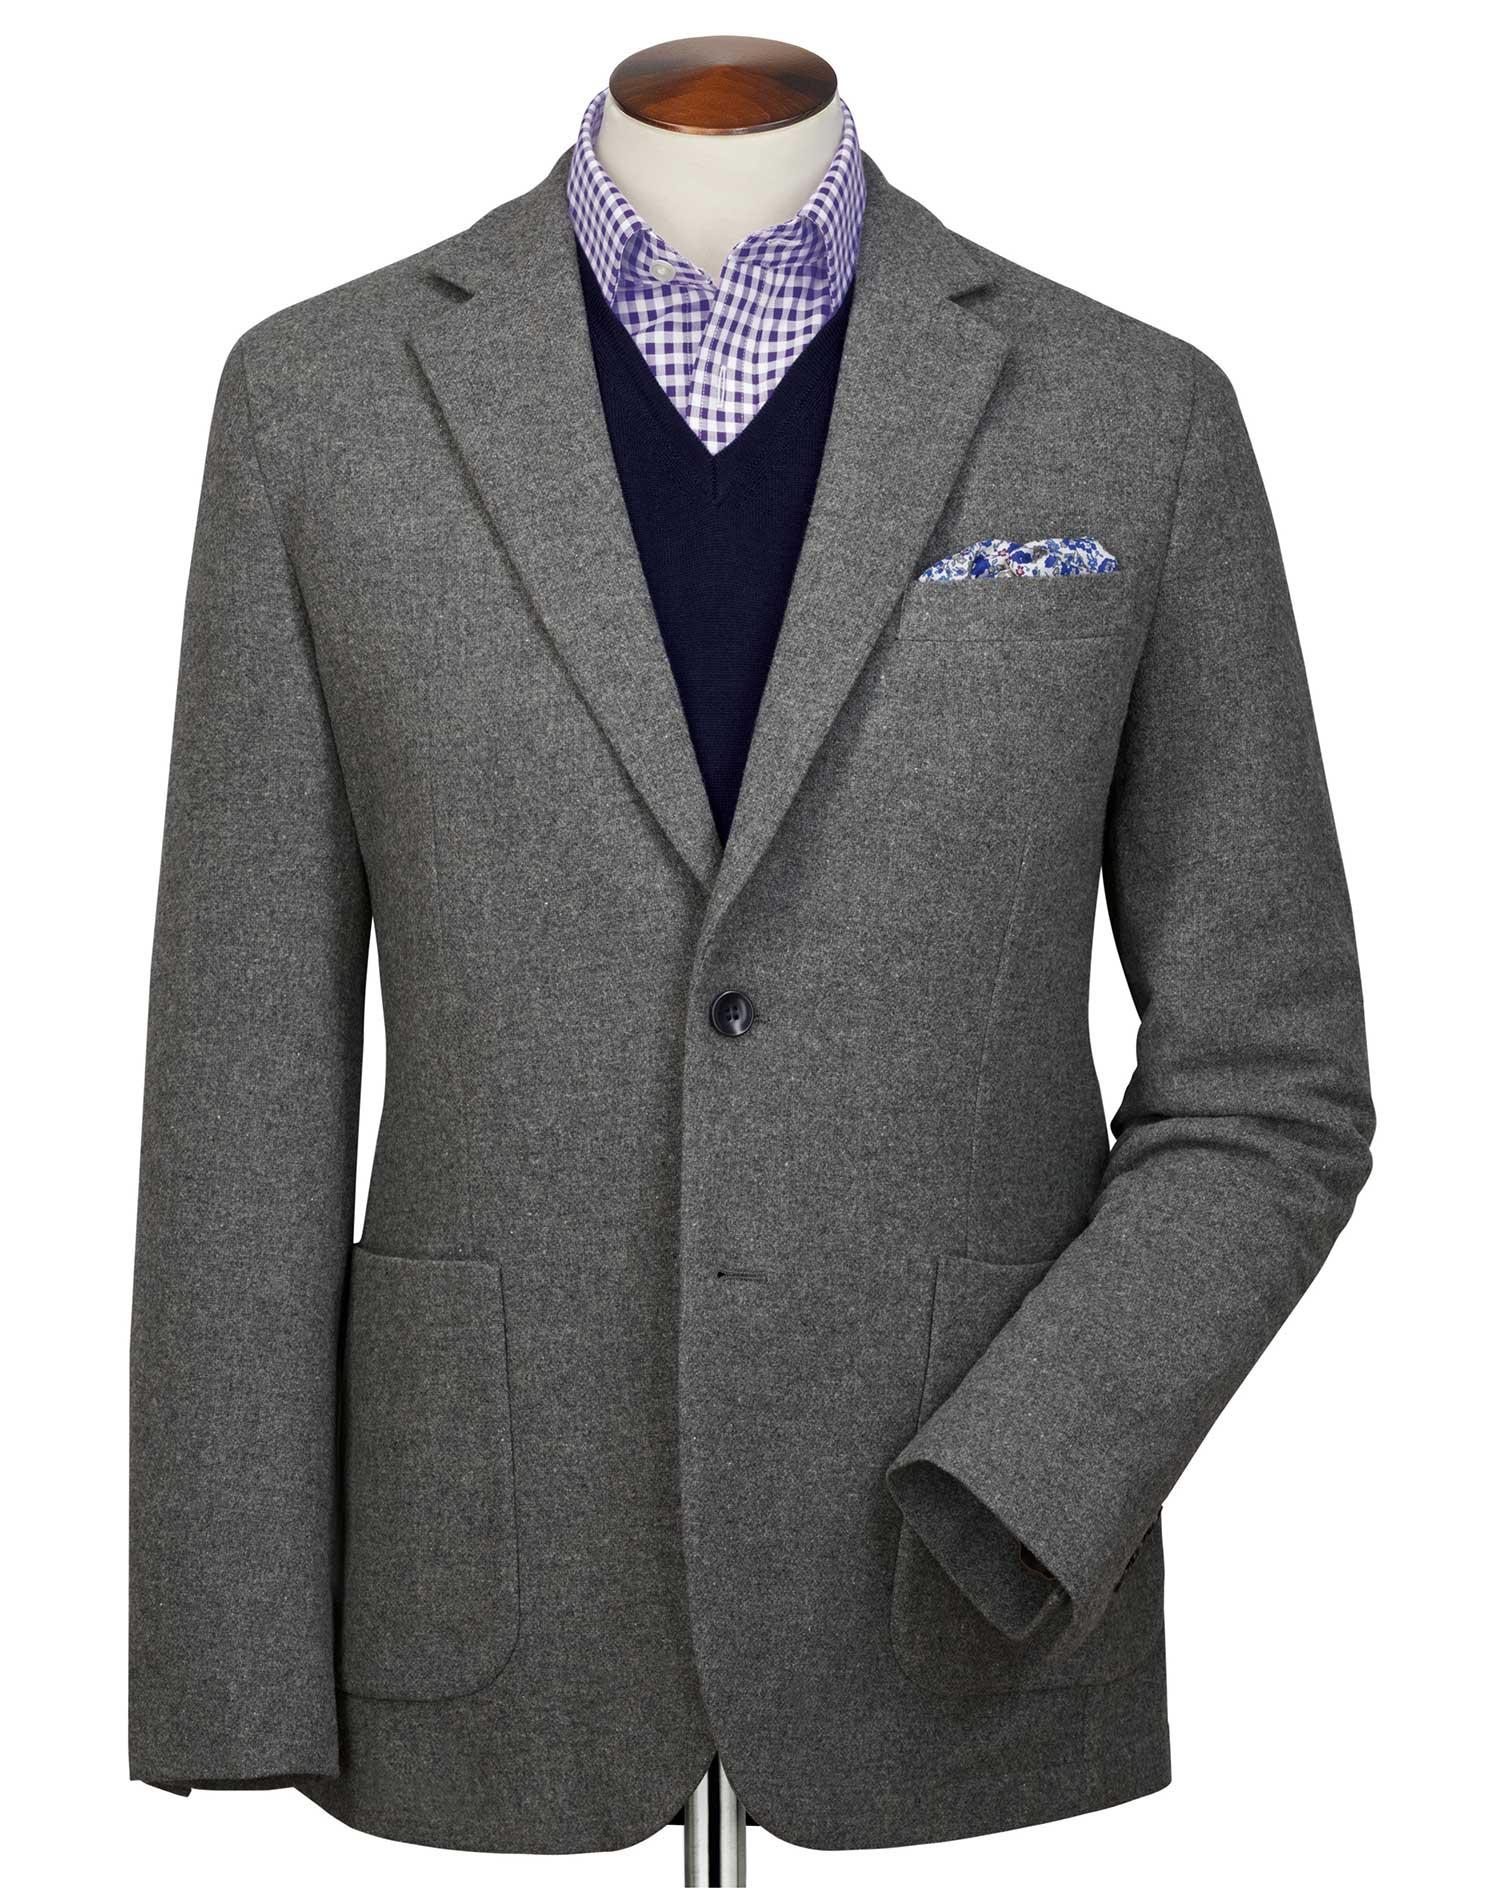 Slim Fit Grey Plain Wool Flannel Blazer Size 42 Short by Charles Tyrwhitt